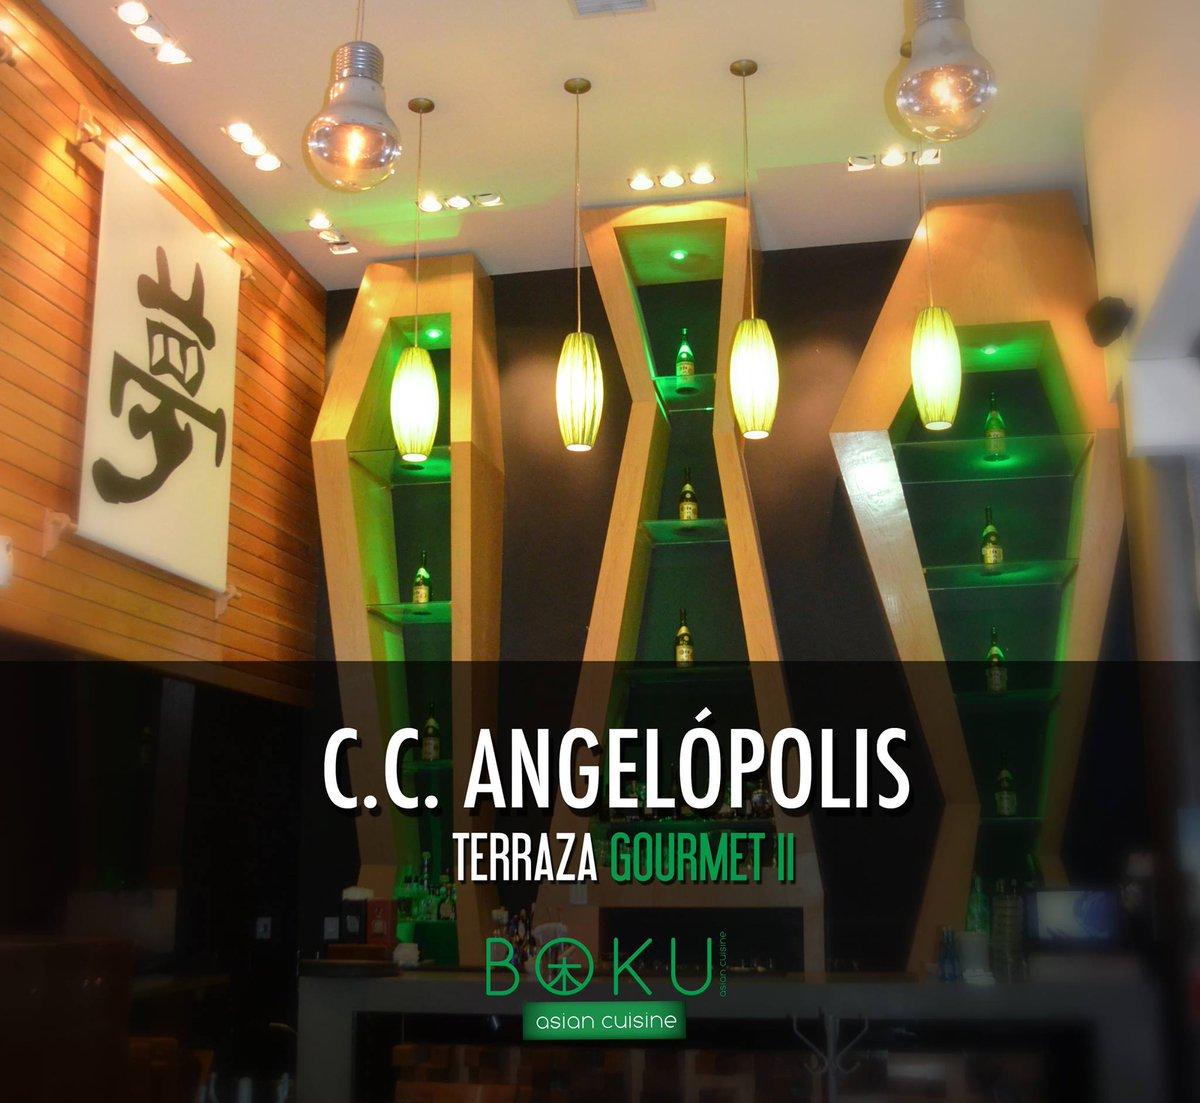 Angelópolis Oficial On Twitter Deléitate Con Una Exquisita